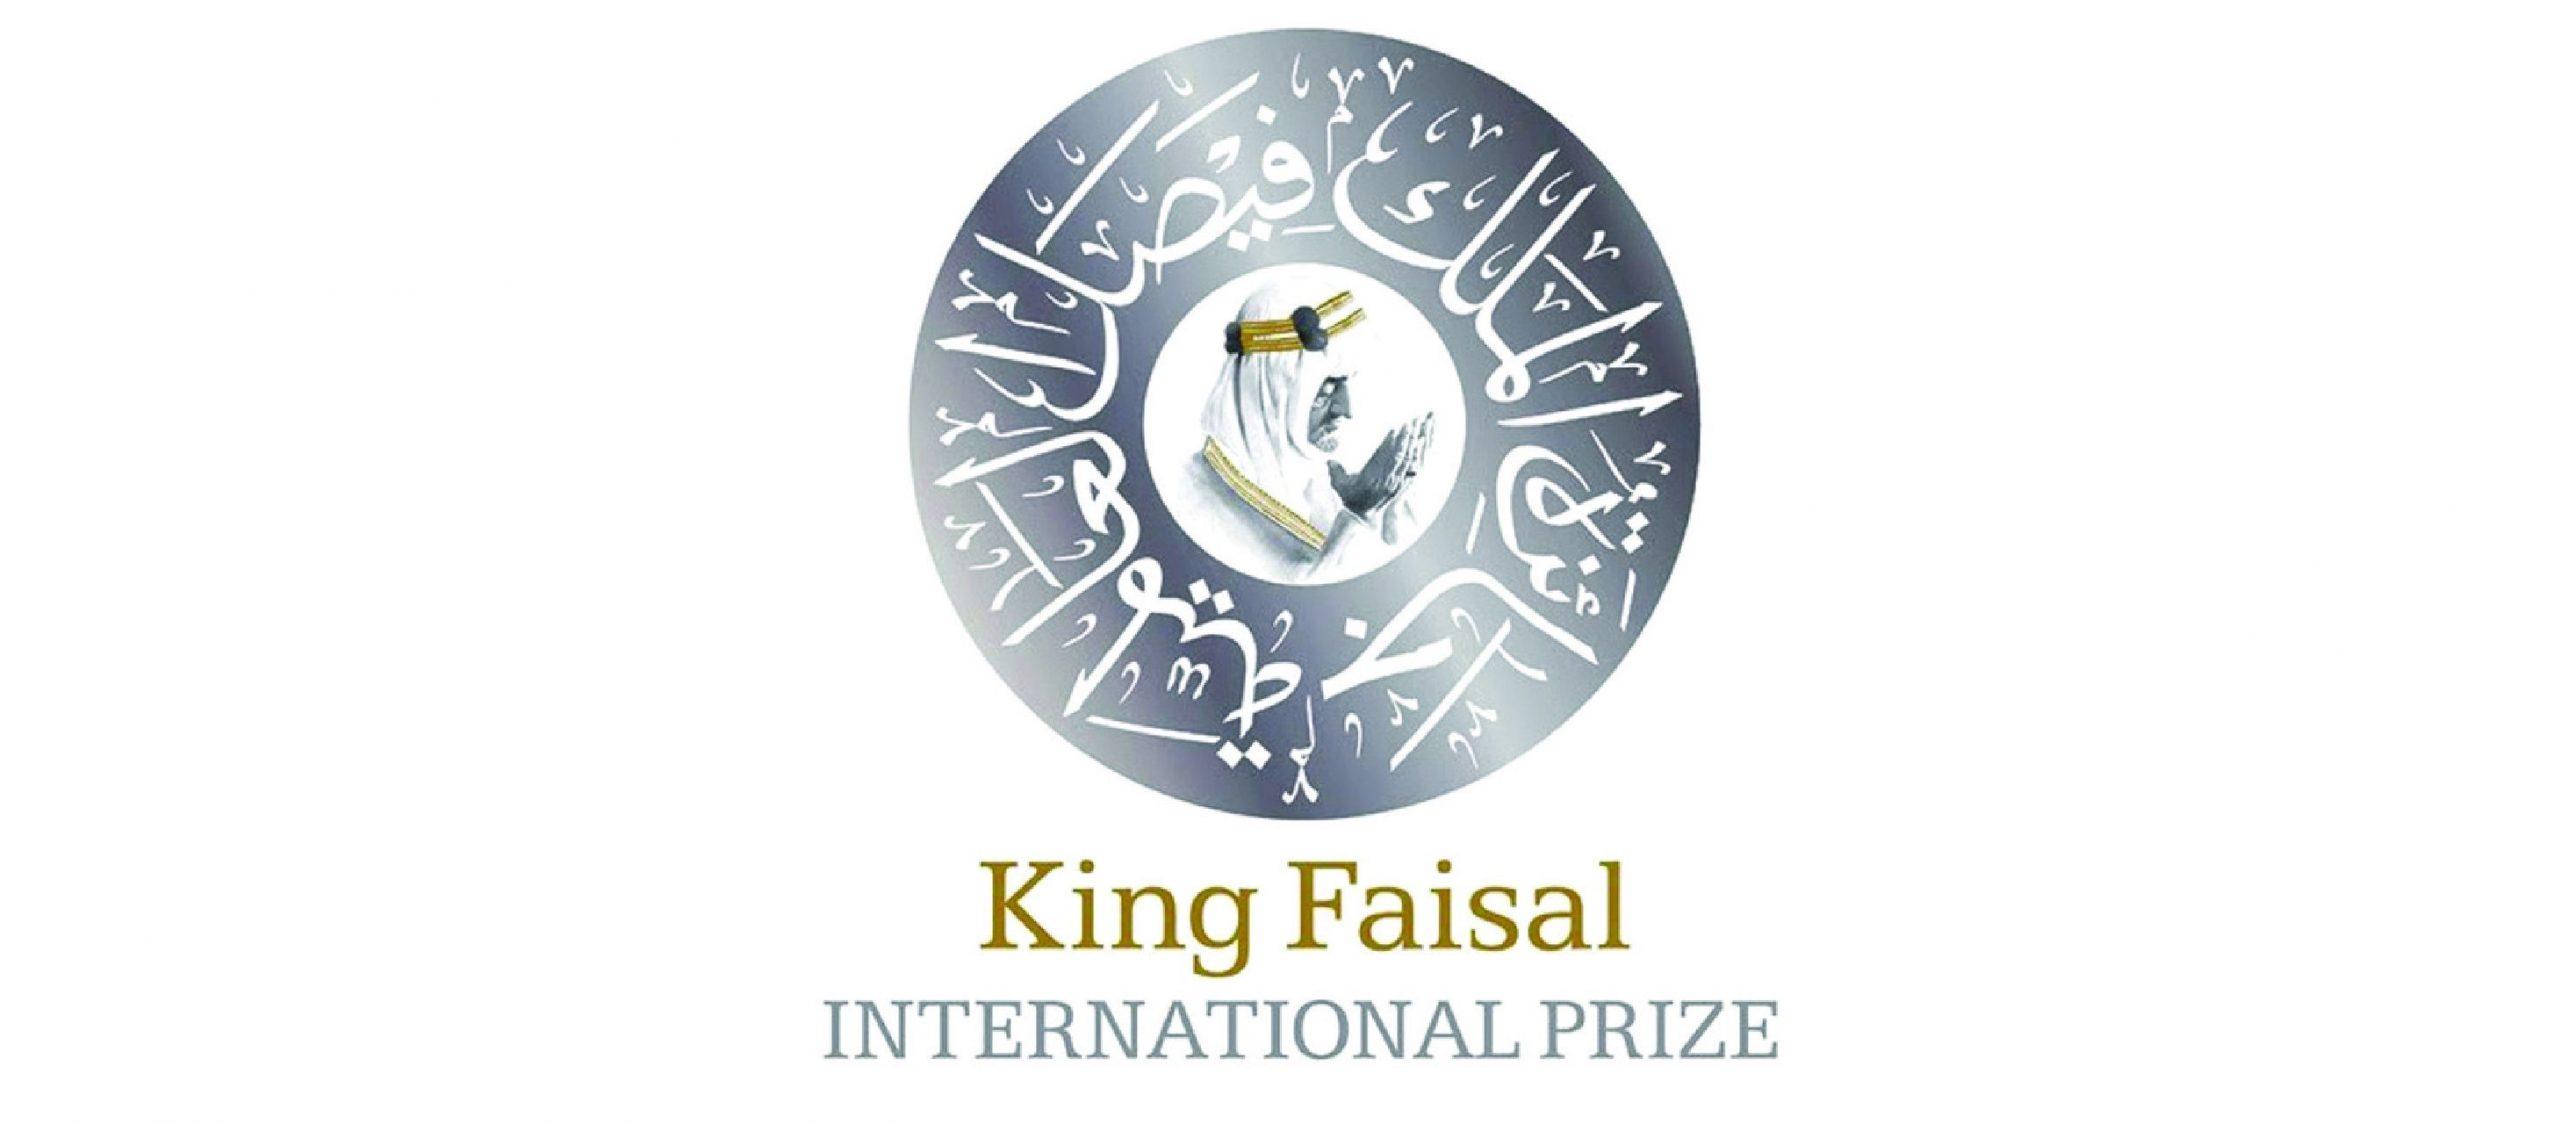 You are currently viewing جائزة الملك فيصل العالمية تعلن نتائجها في 10 فبراير الجاري